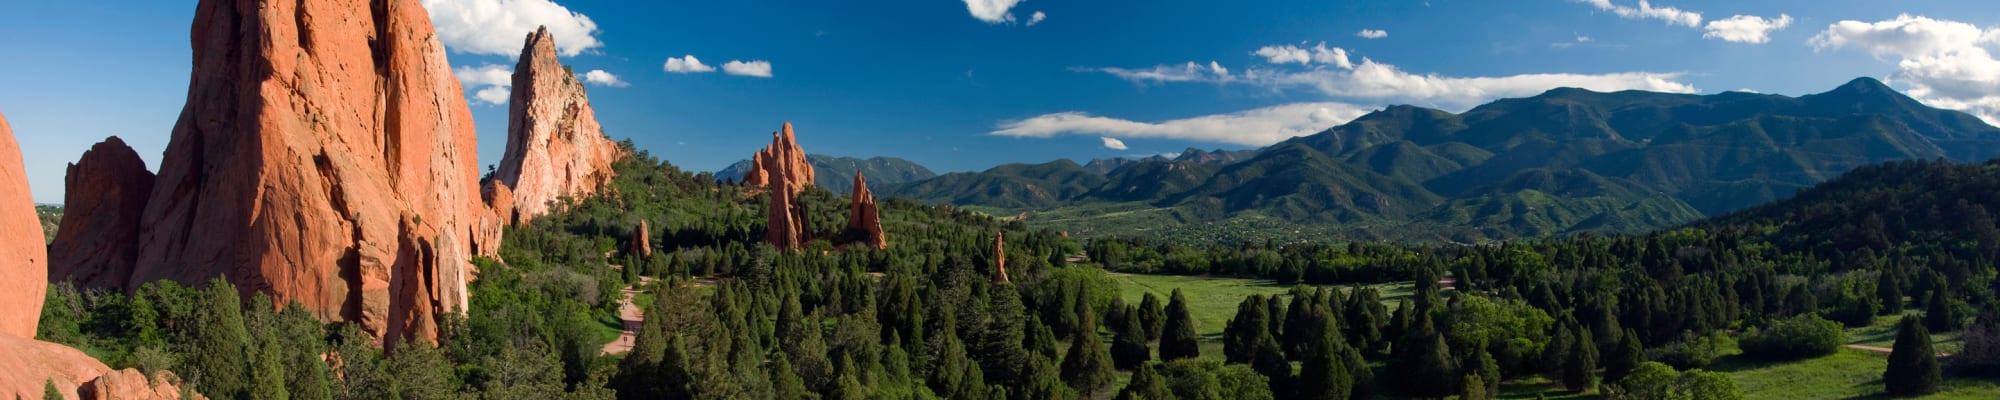 Information for residents of Enchanted Springs Apartments in Colorado Springs, Colorado